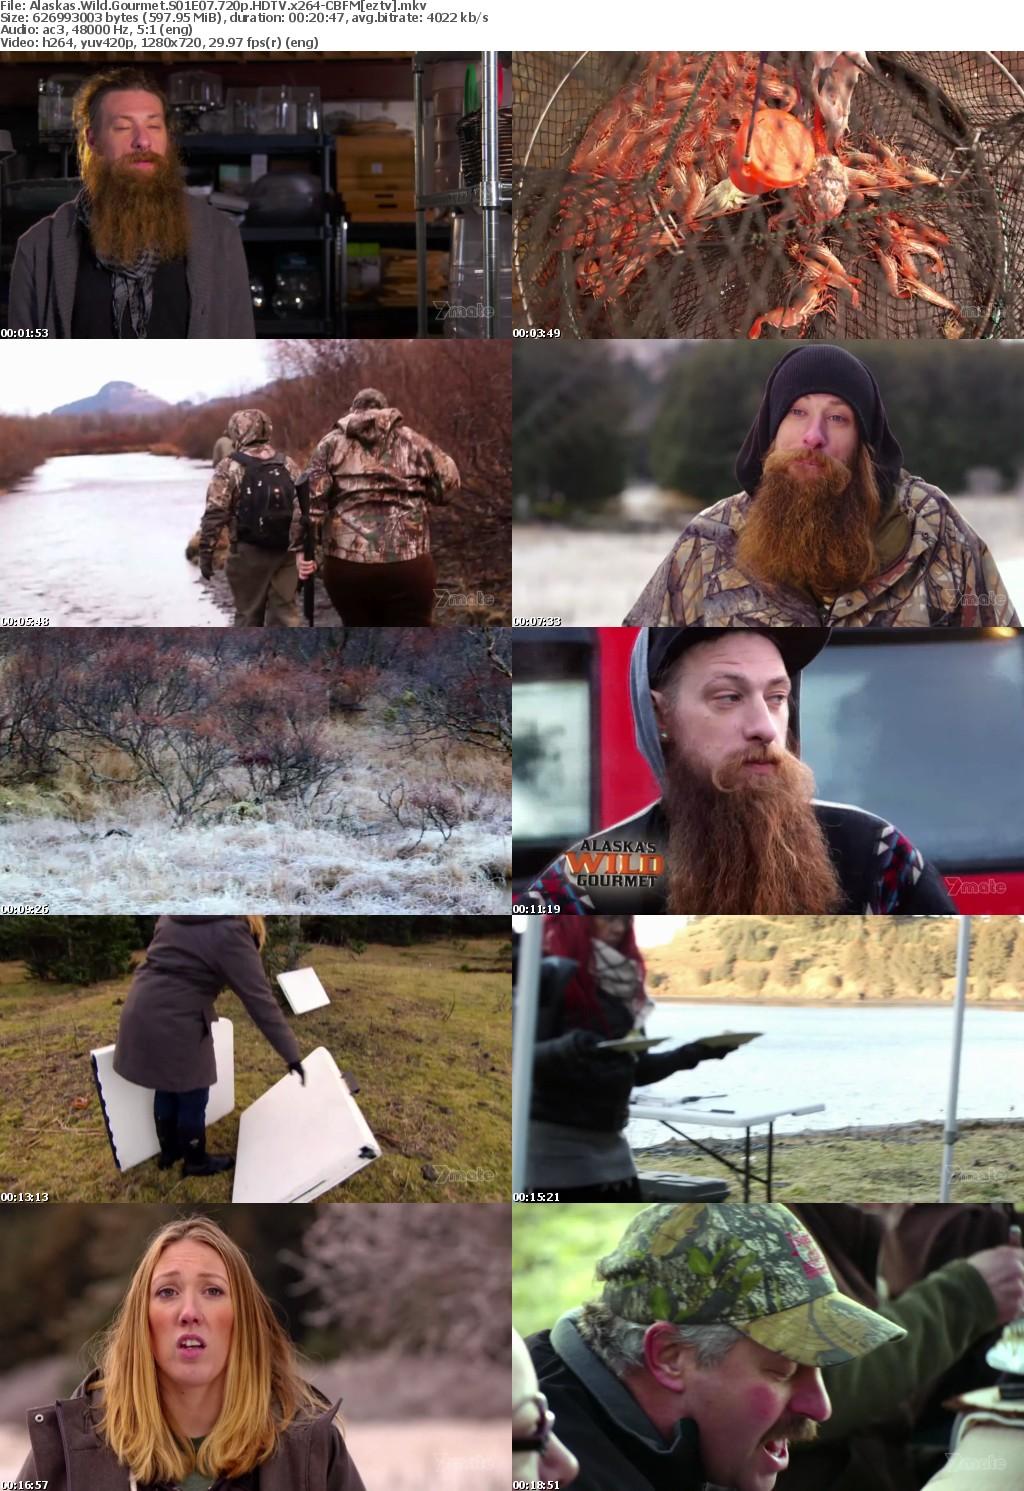 Alaskas Wild Gourmet S01E07 720p HDTV x264-CBFM